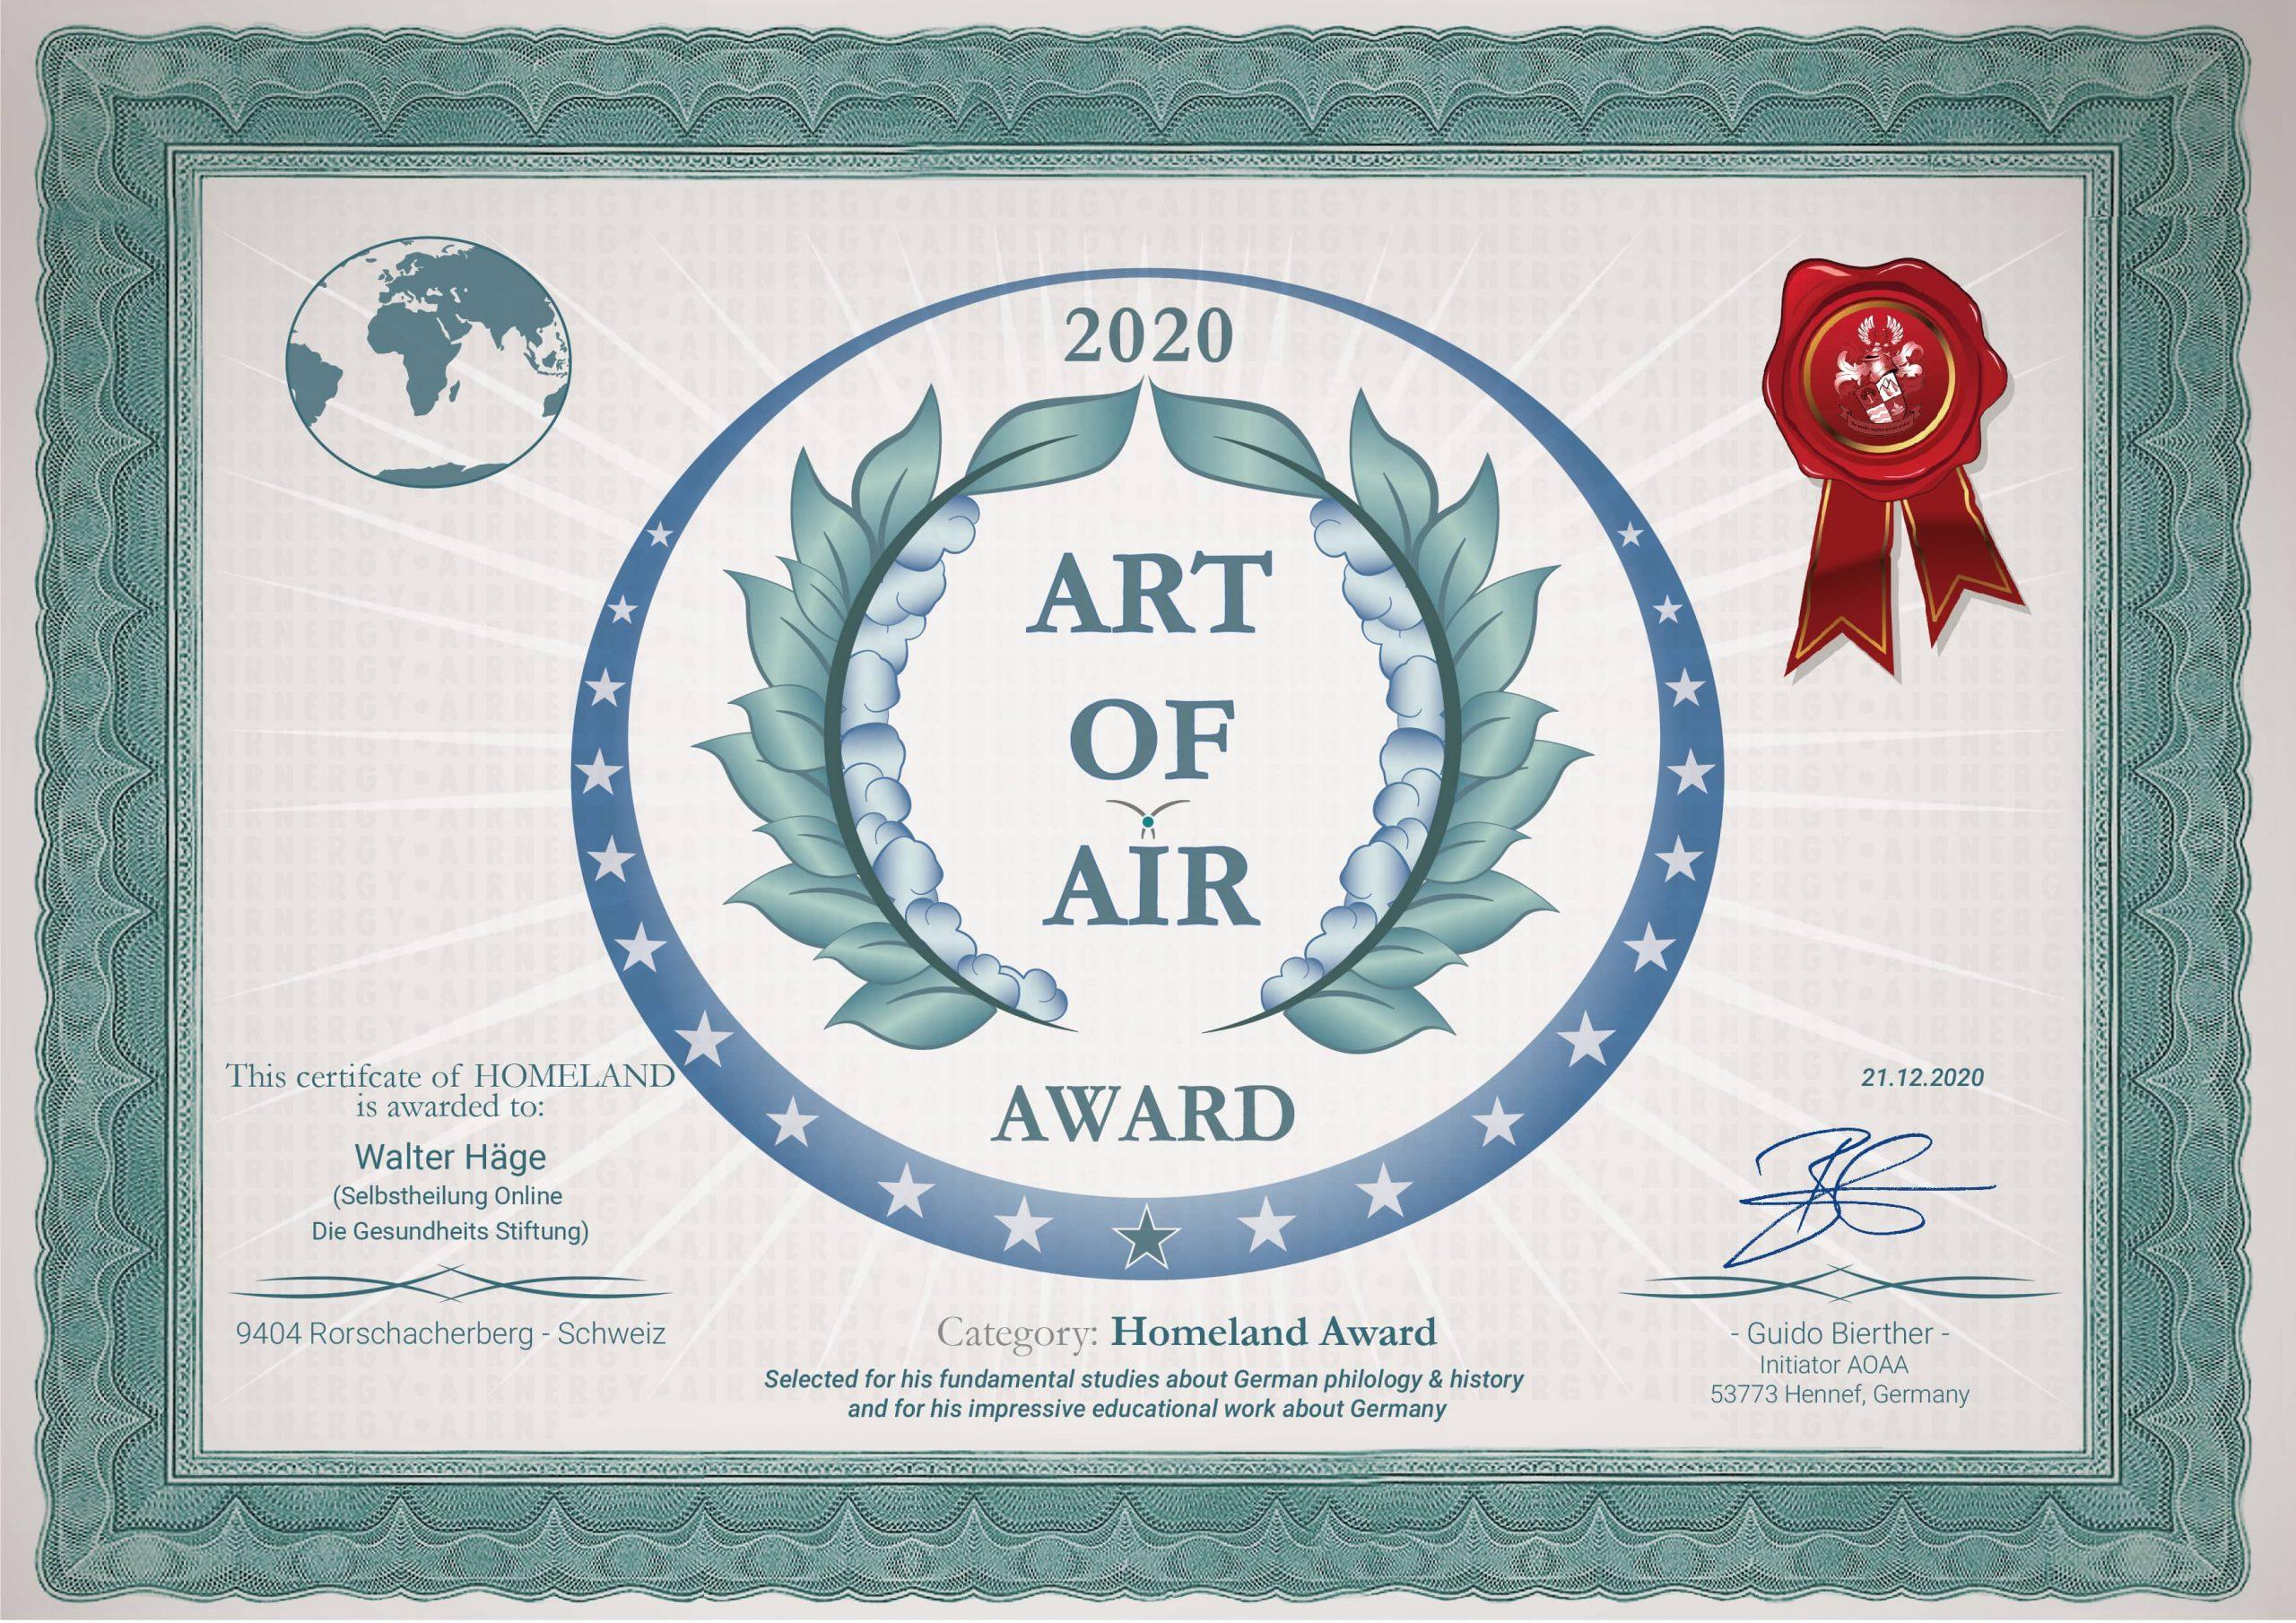 Homeland Award